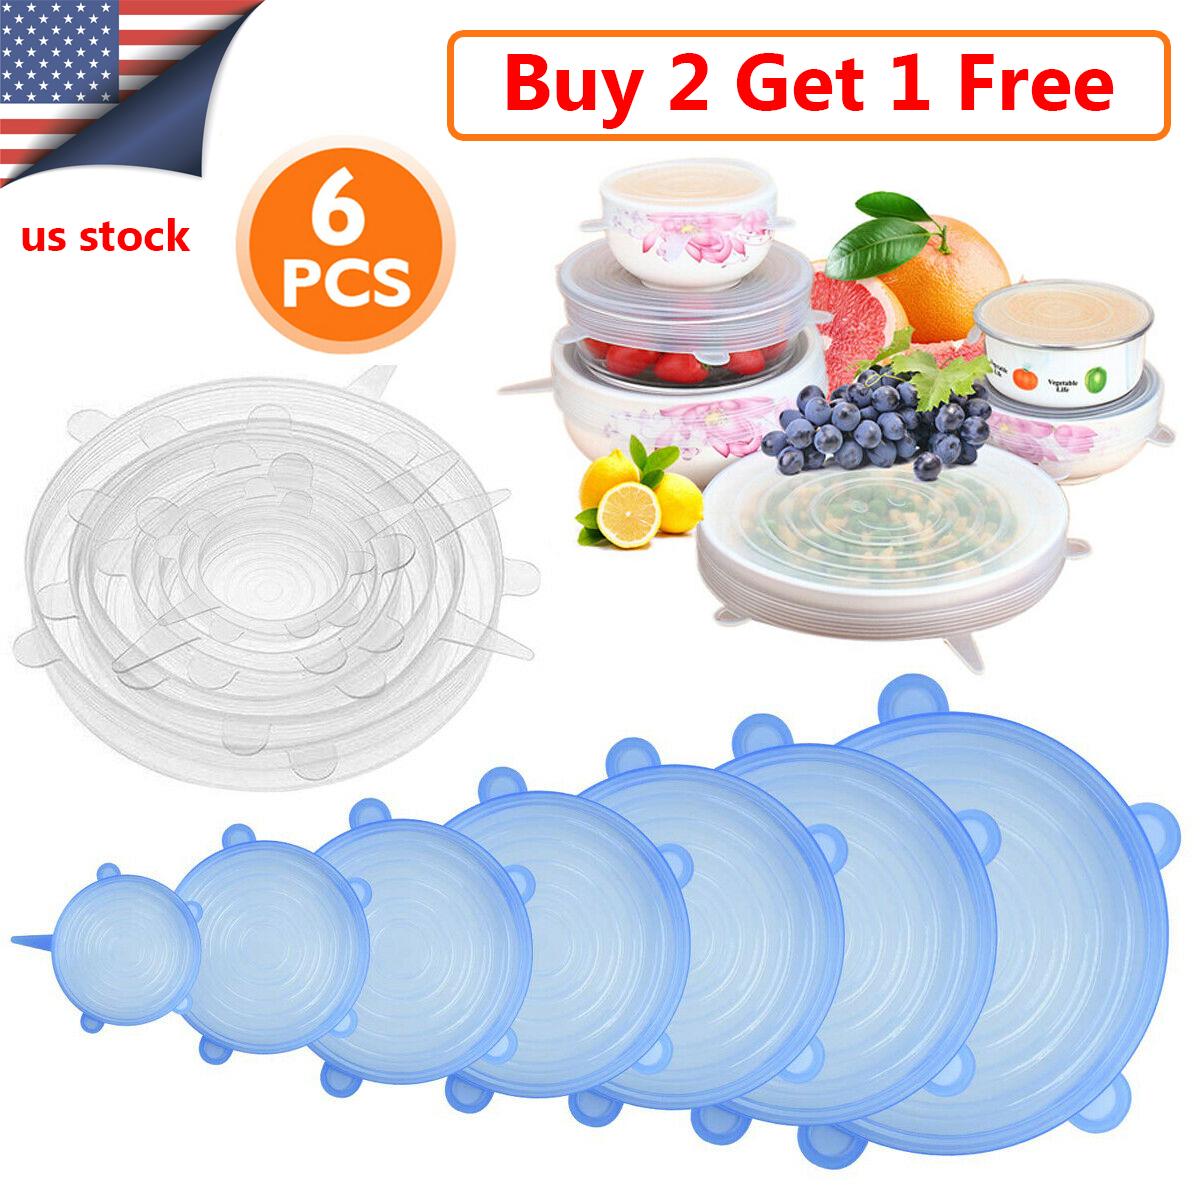 6Pcs Reusable Extensible Lids Food Bowl Airtight Suction Cover Food Storage Wrap